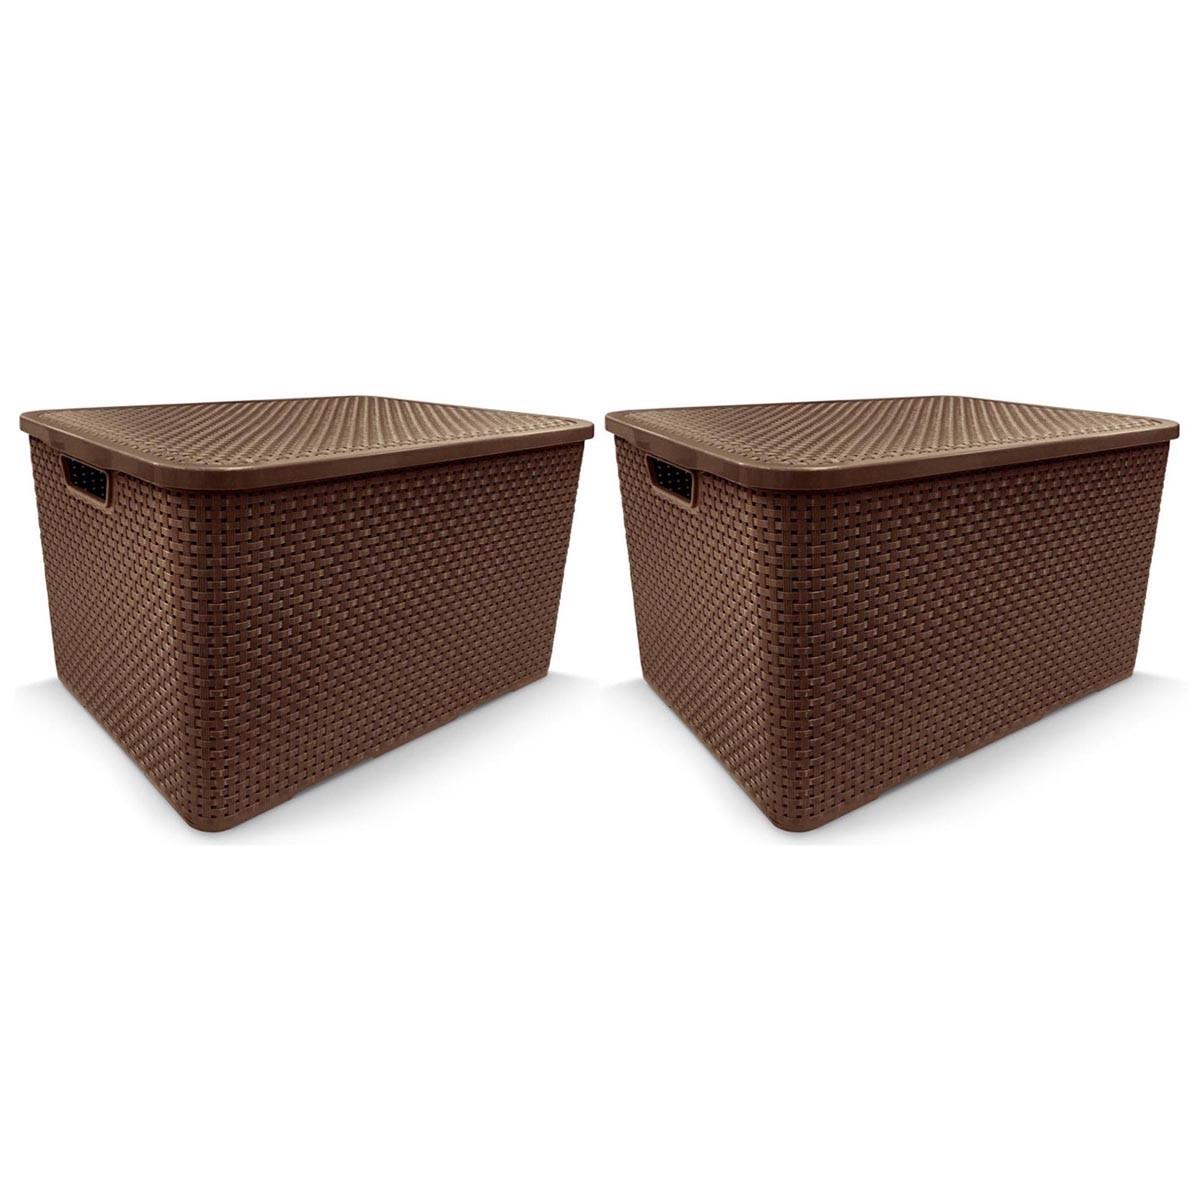 KIT 2 Caixa Organizadora Plástica Marrom Cesto Rattan 40 Litros